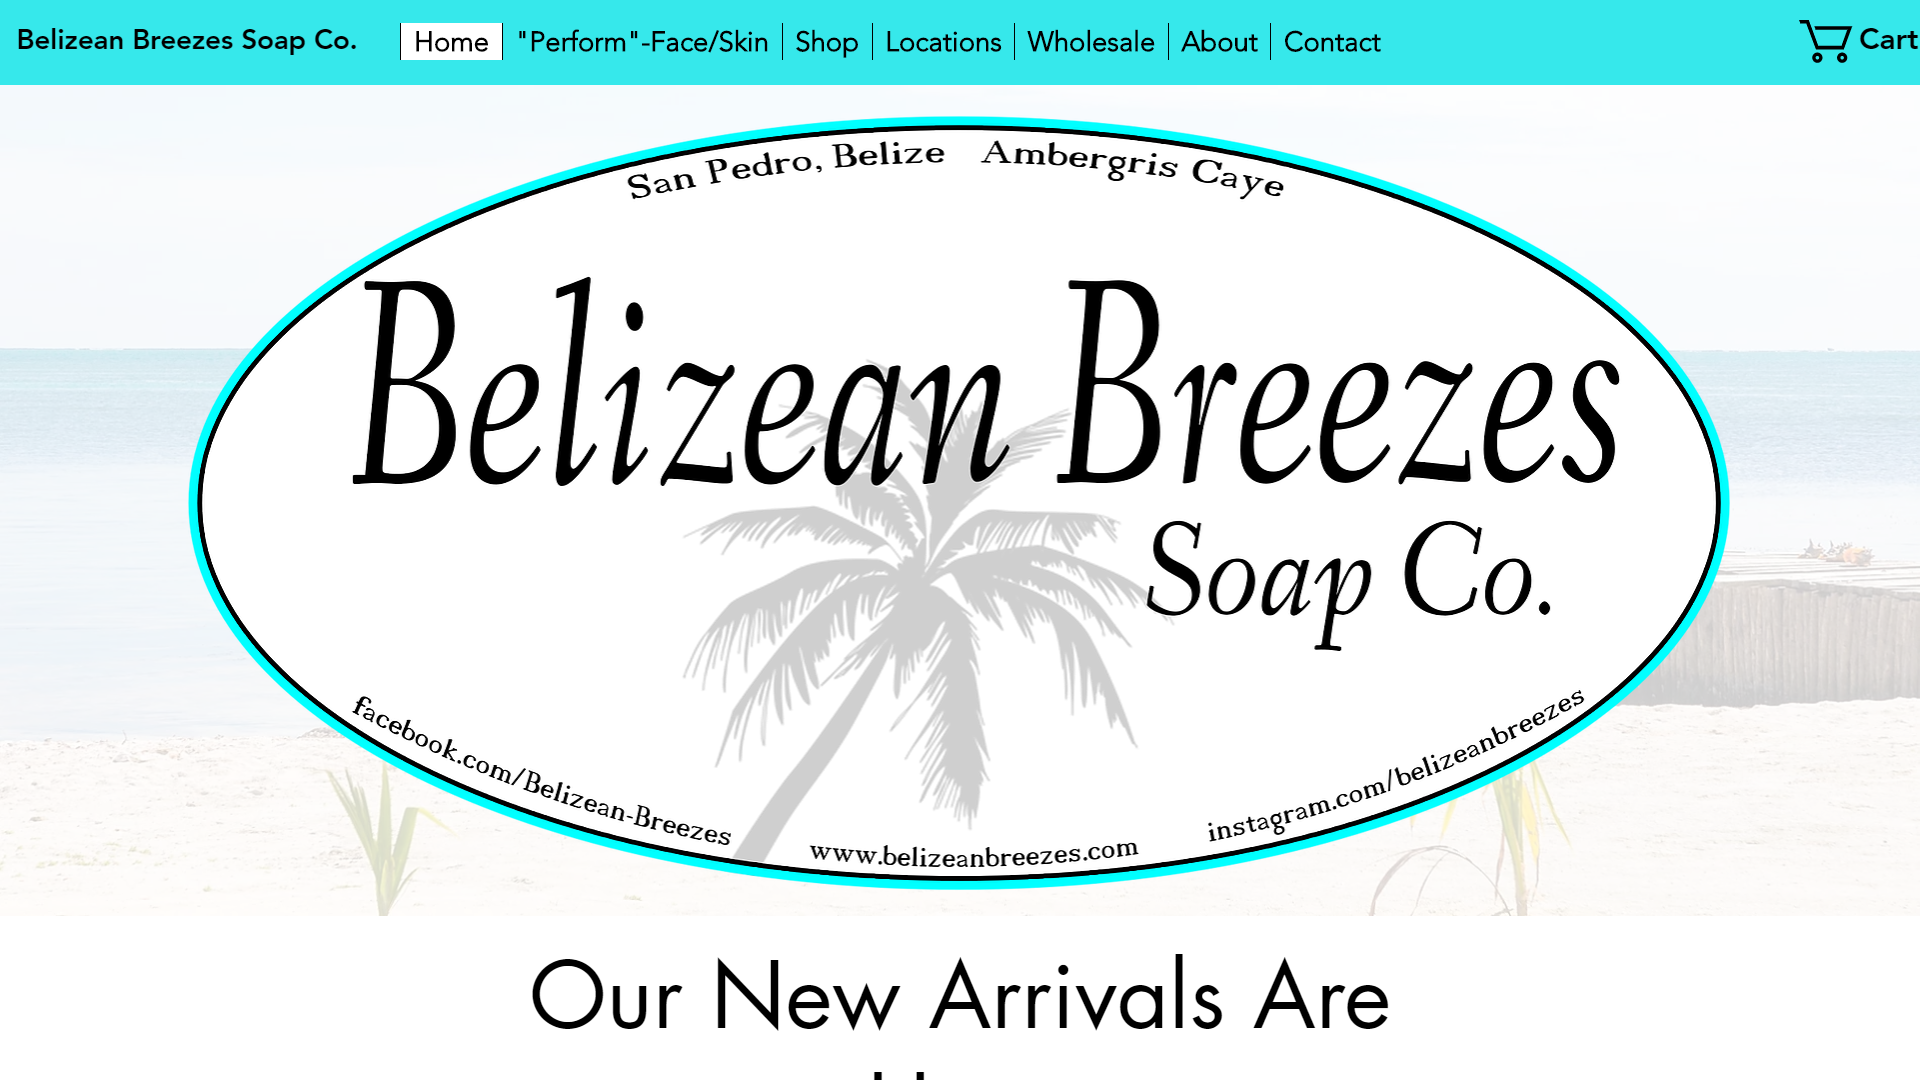 Belizeanbreezes.com/